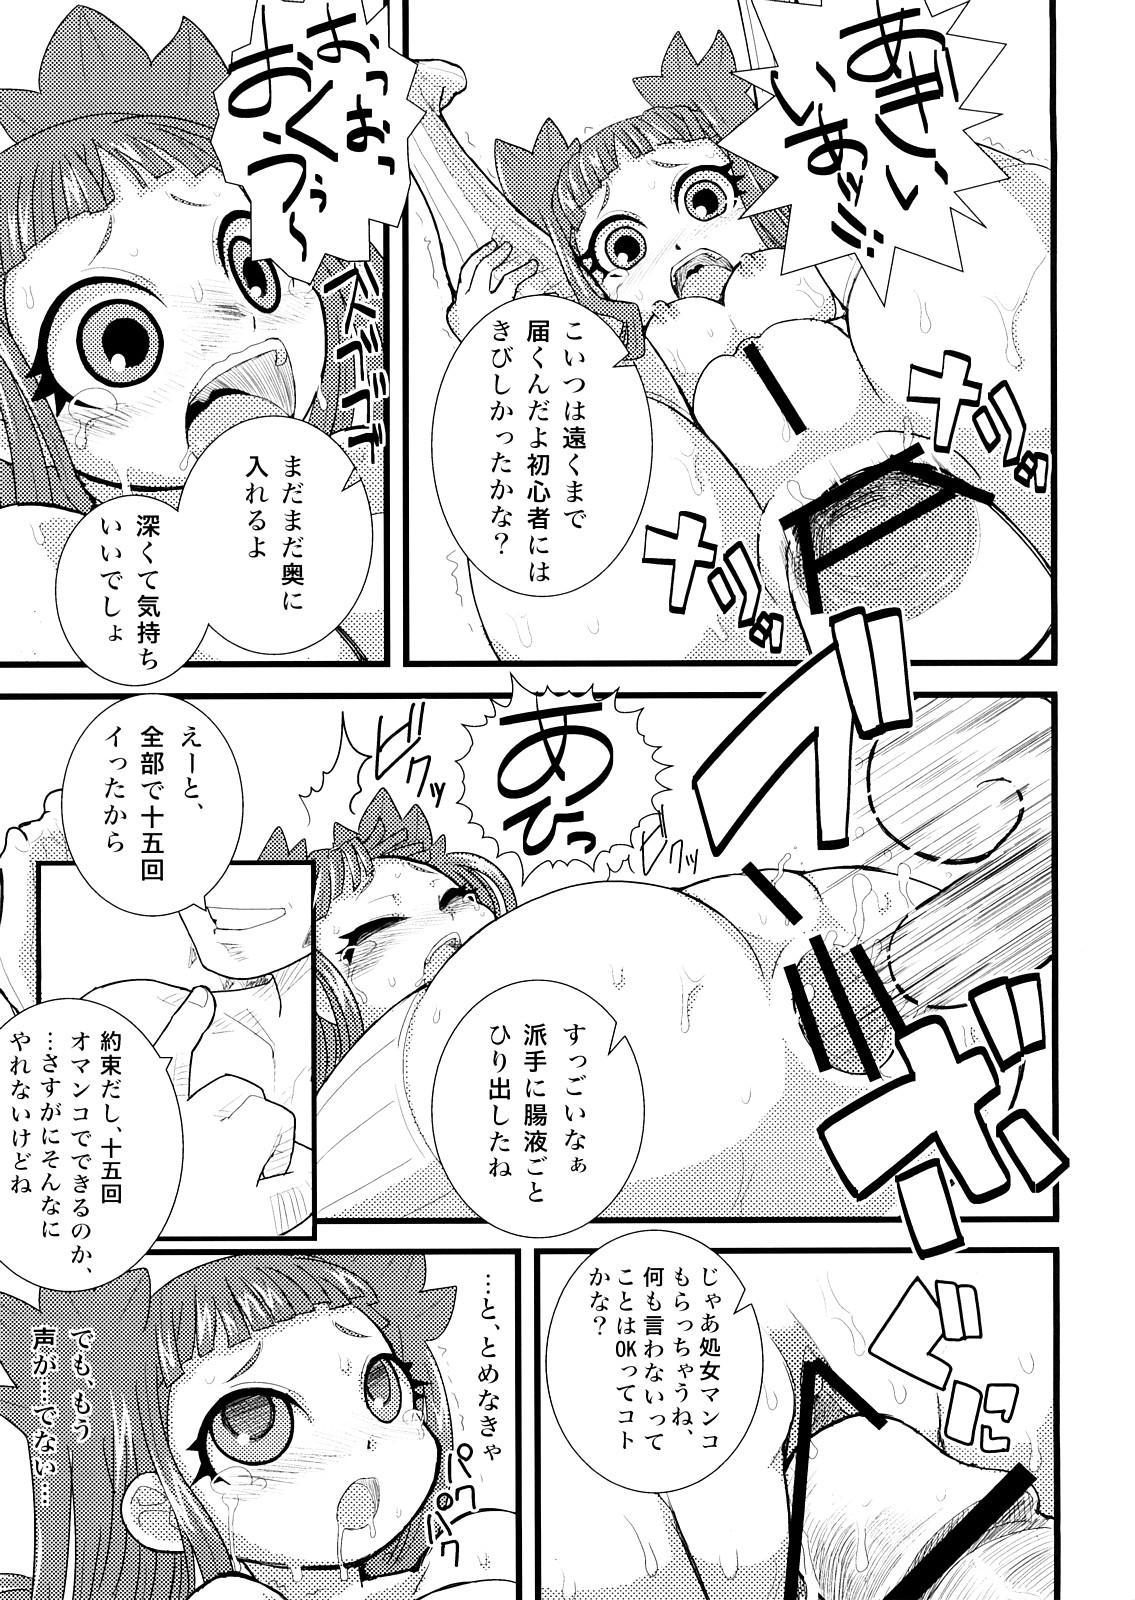 DS tte Omoshiroi Game ga Ookute Suteki 27